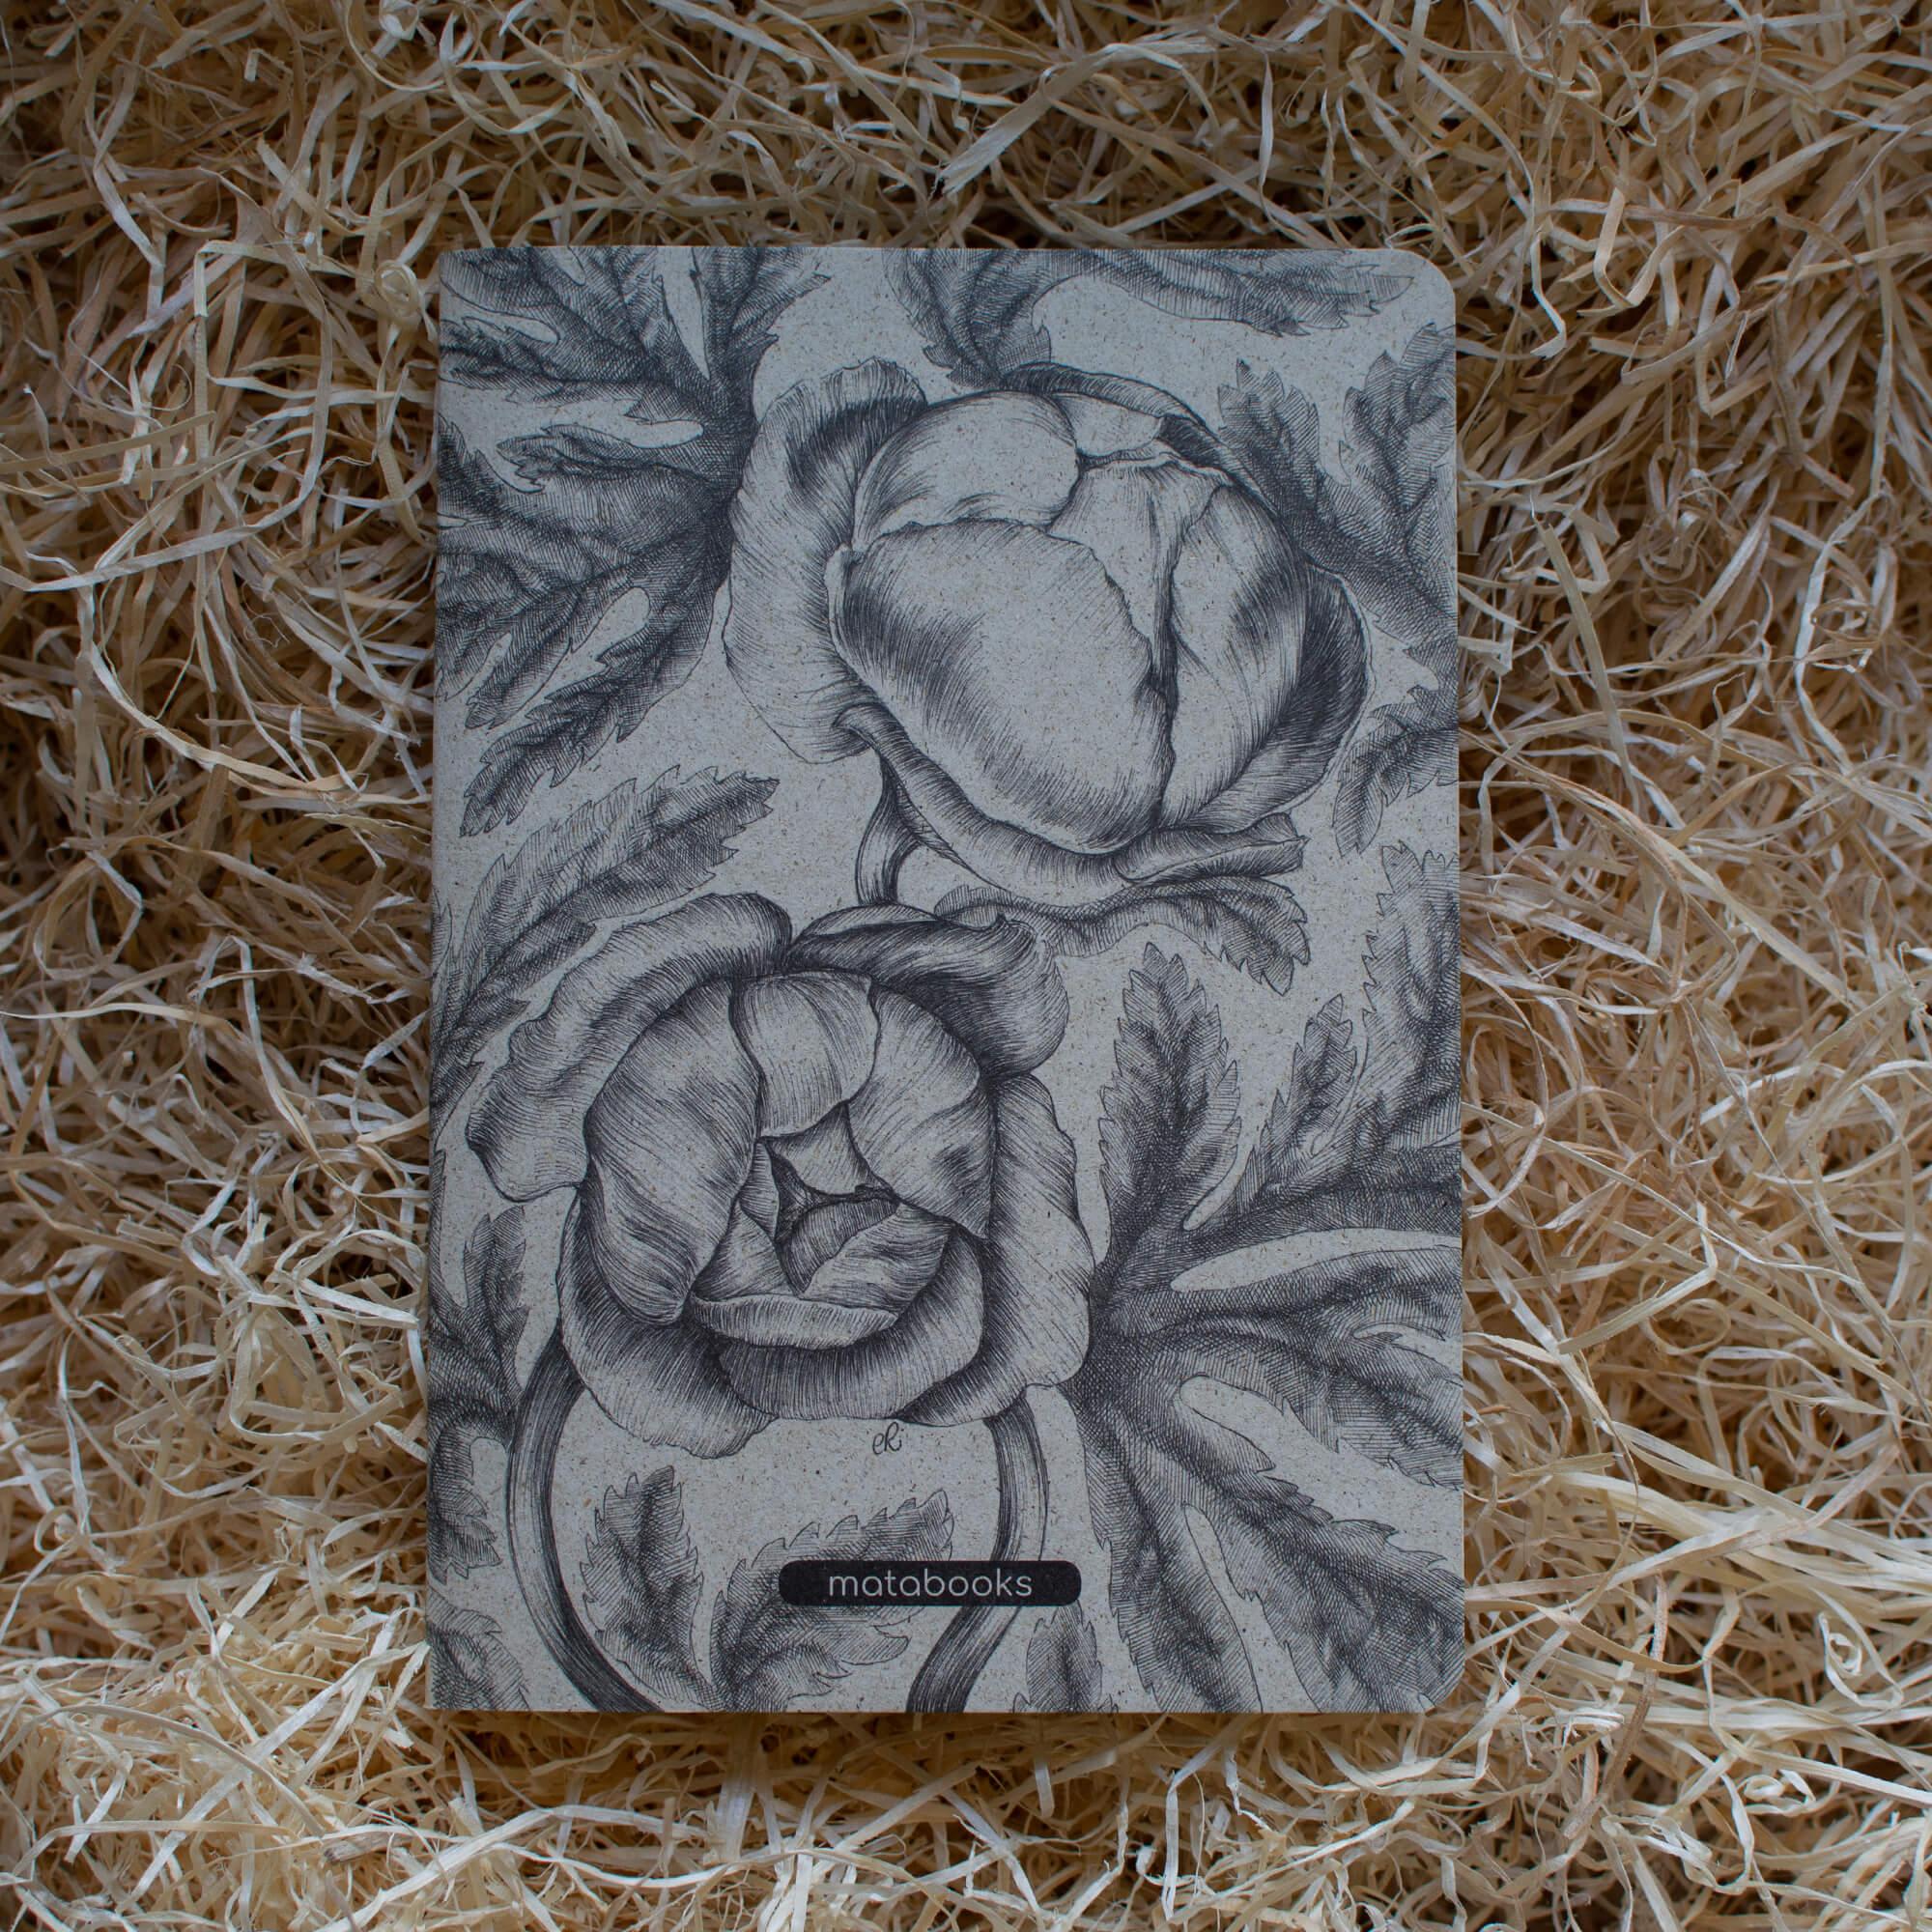 matabooks_tara_notizheft_botanical